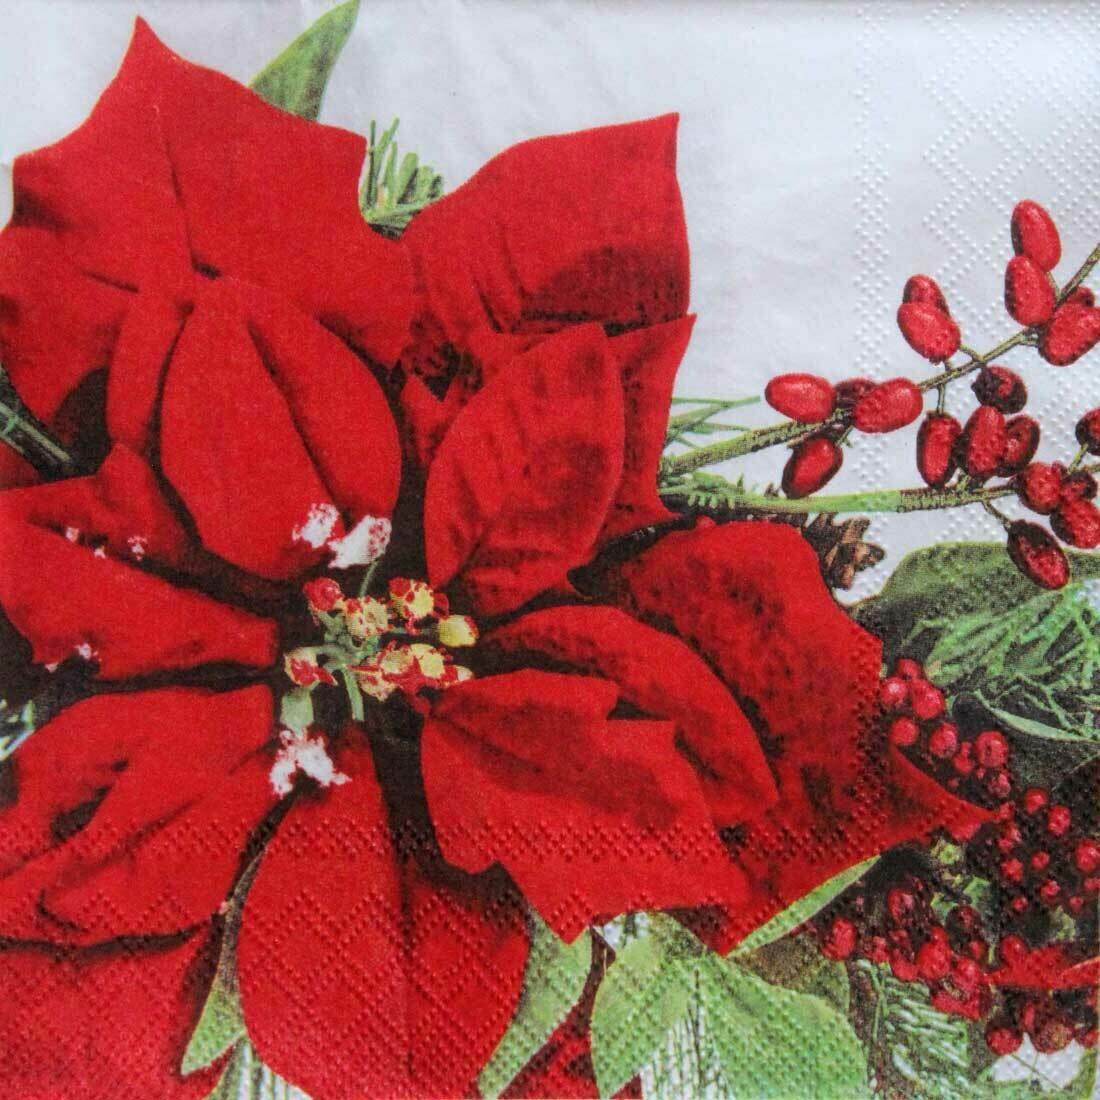 Decoupage Paper Napkins - Floral - Amilia Rot 13x13 (1 Sheet)